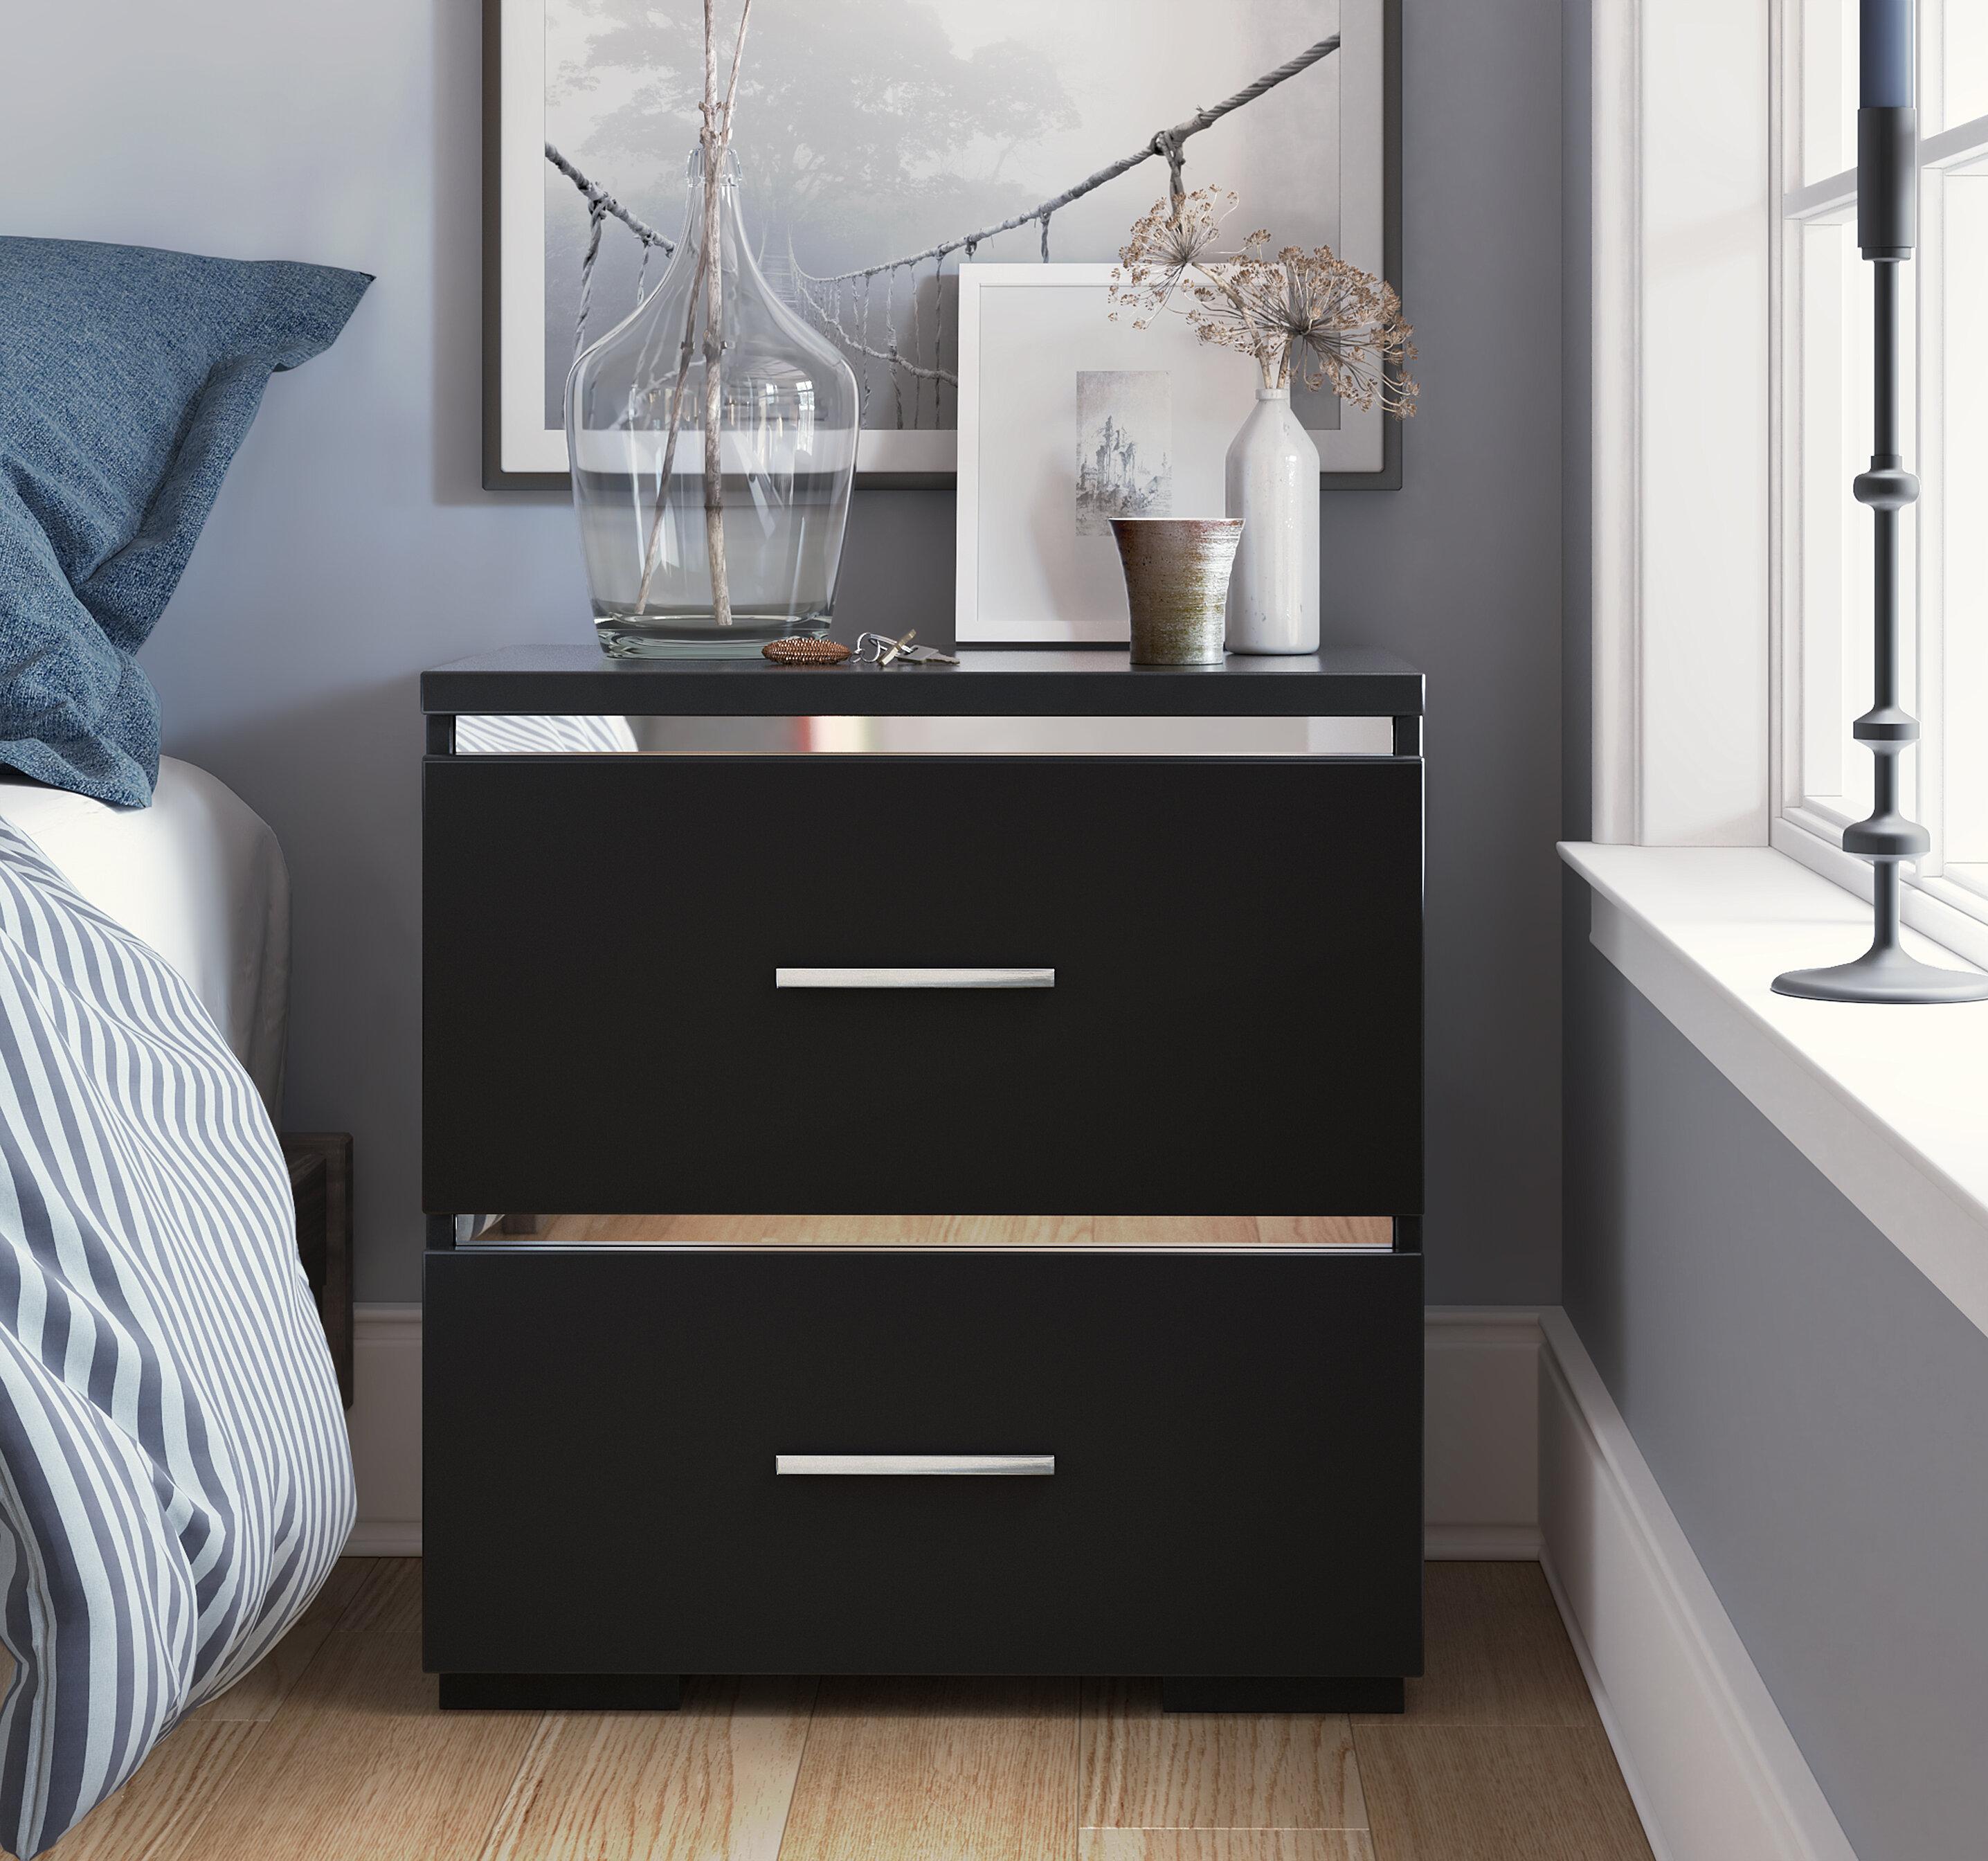 Bedside Tables Cabinets Bedroom Uv Matt High Gloss Bedside Drawer Cabinet Table 4 Handles Wood Furniture Home Furniture Diy Cruzeirista Com Br